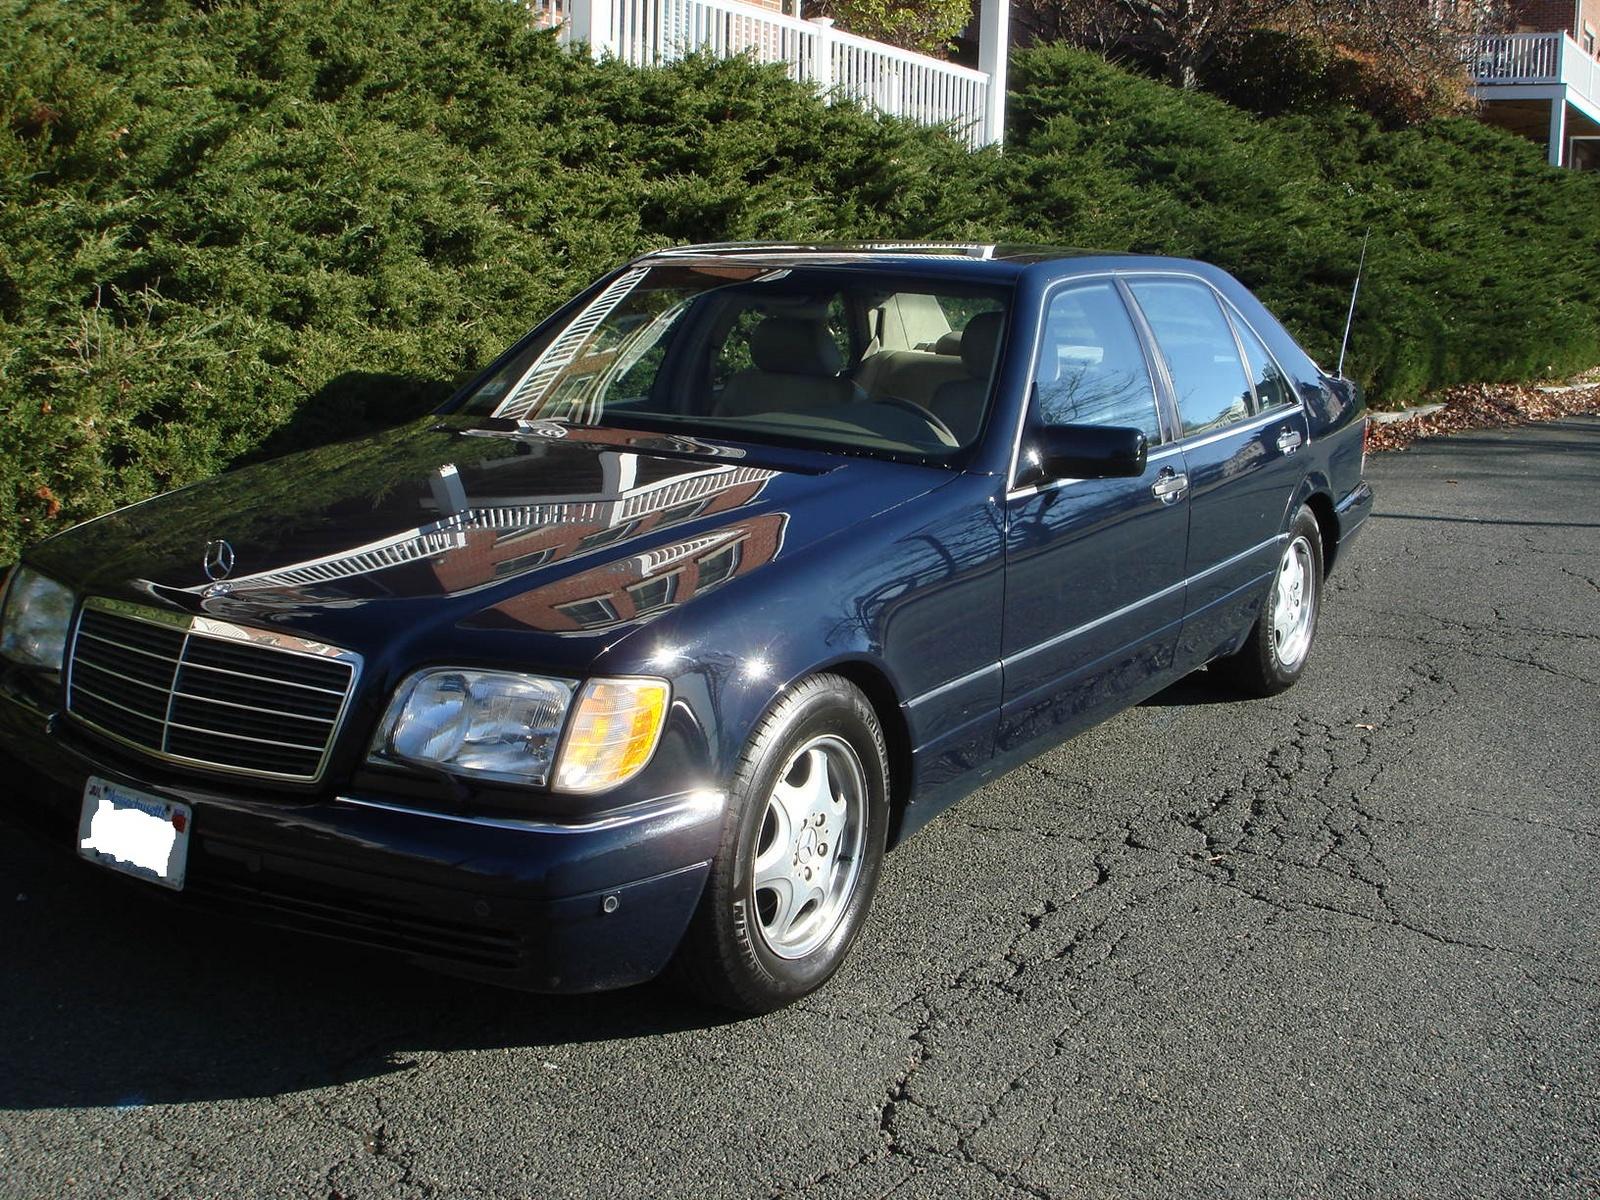 1999 Mercedes-Benz S-Class - Pictures - CarGurus